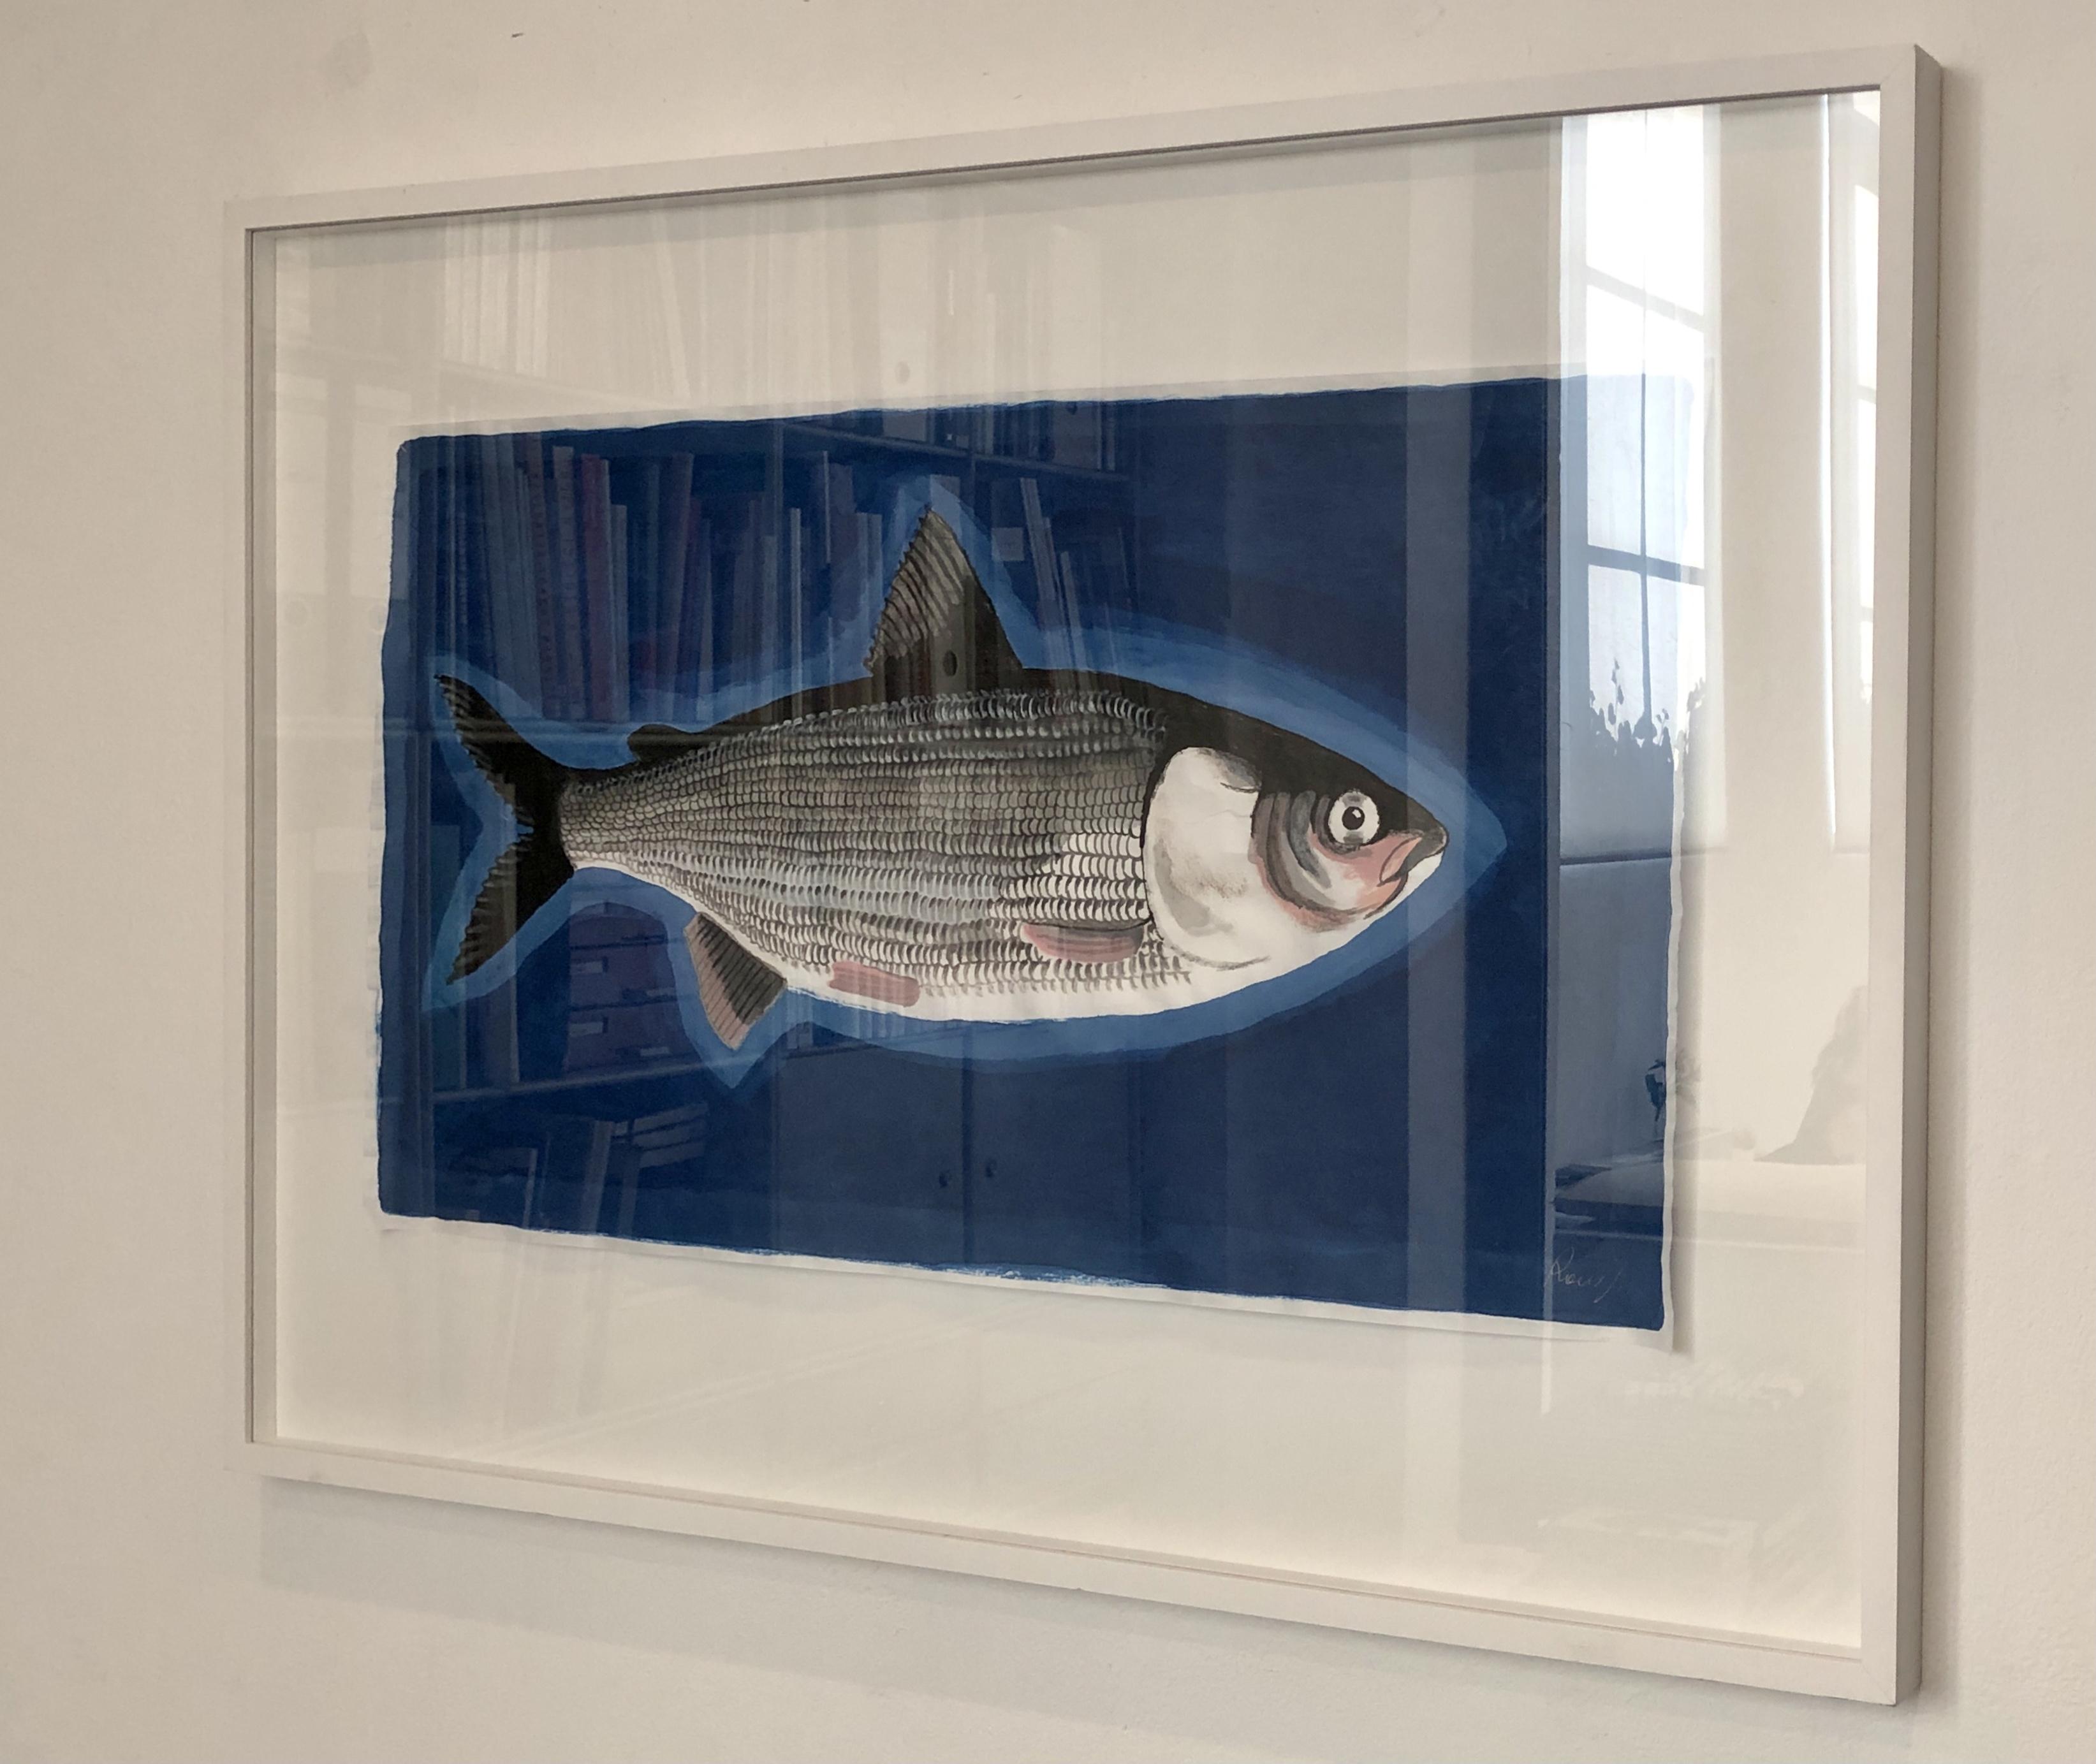 Sardine, 2021, Tinte, Gouache, Acryl auf Japanpapier, 45 x 80 cm